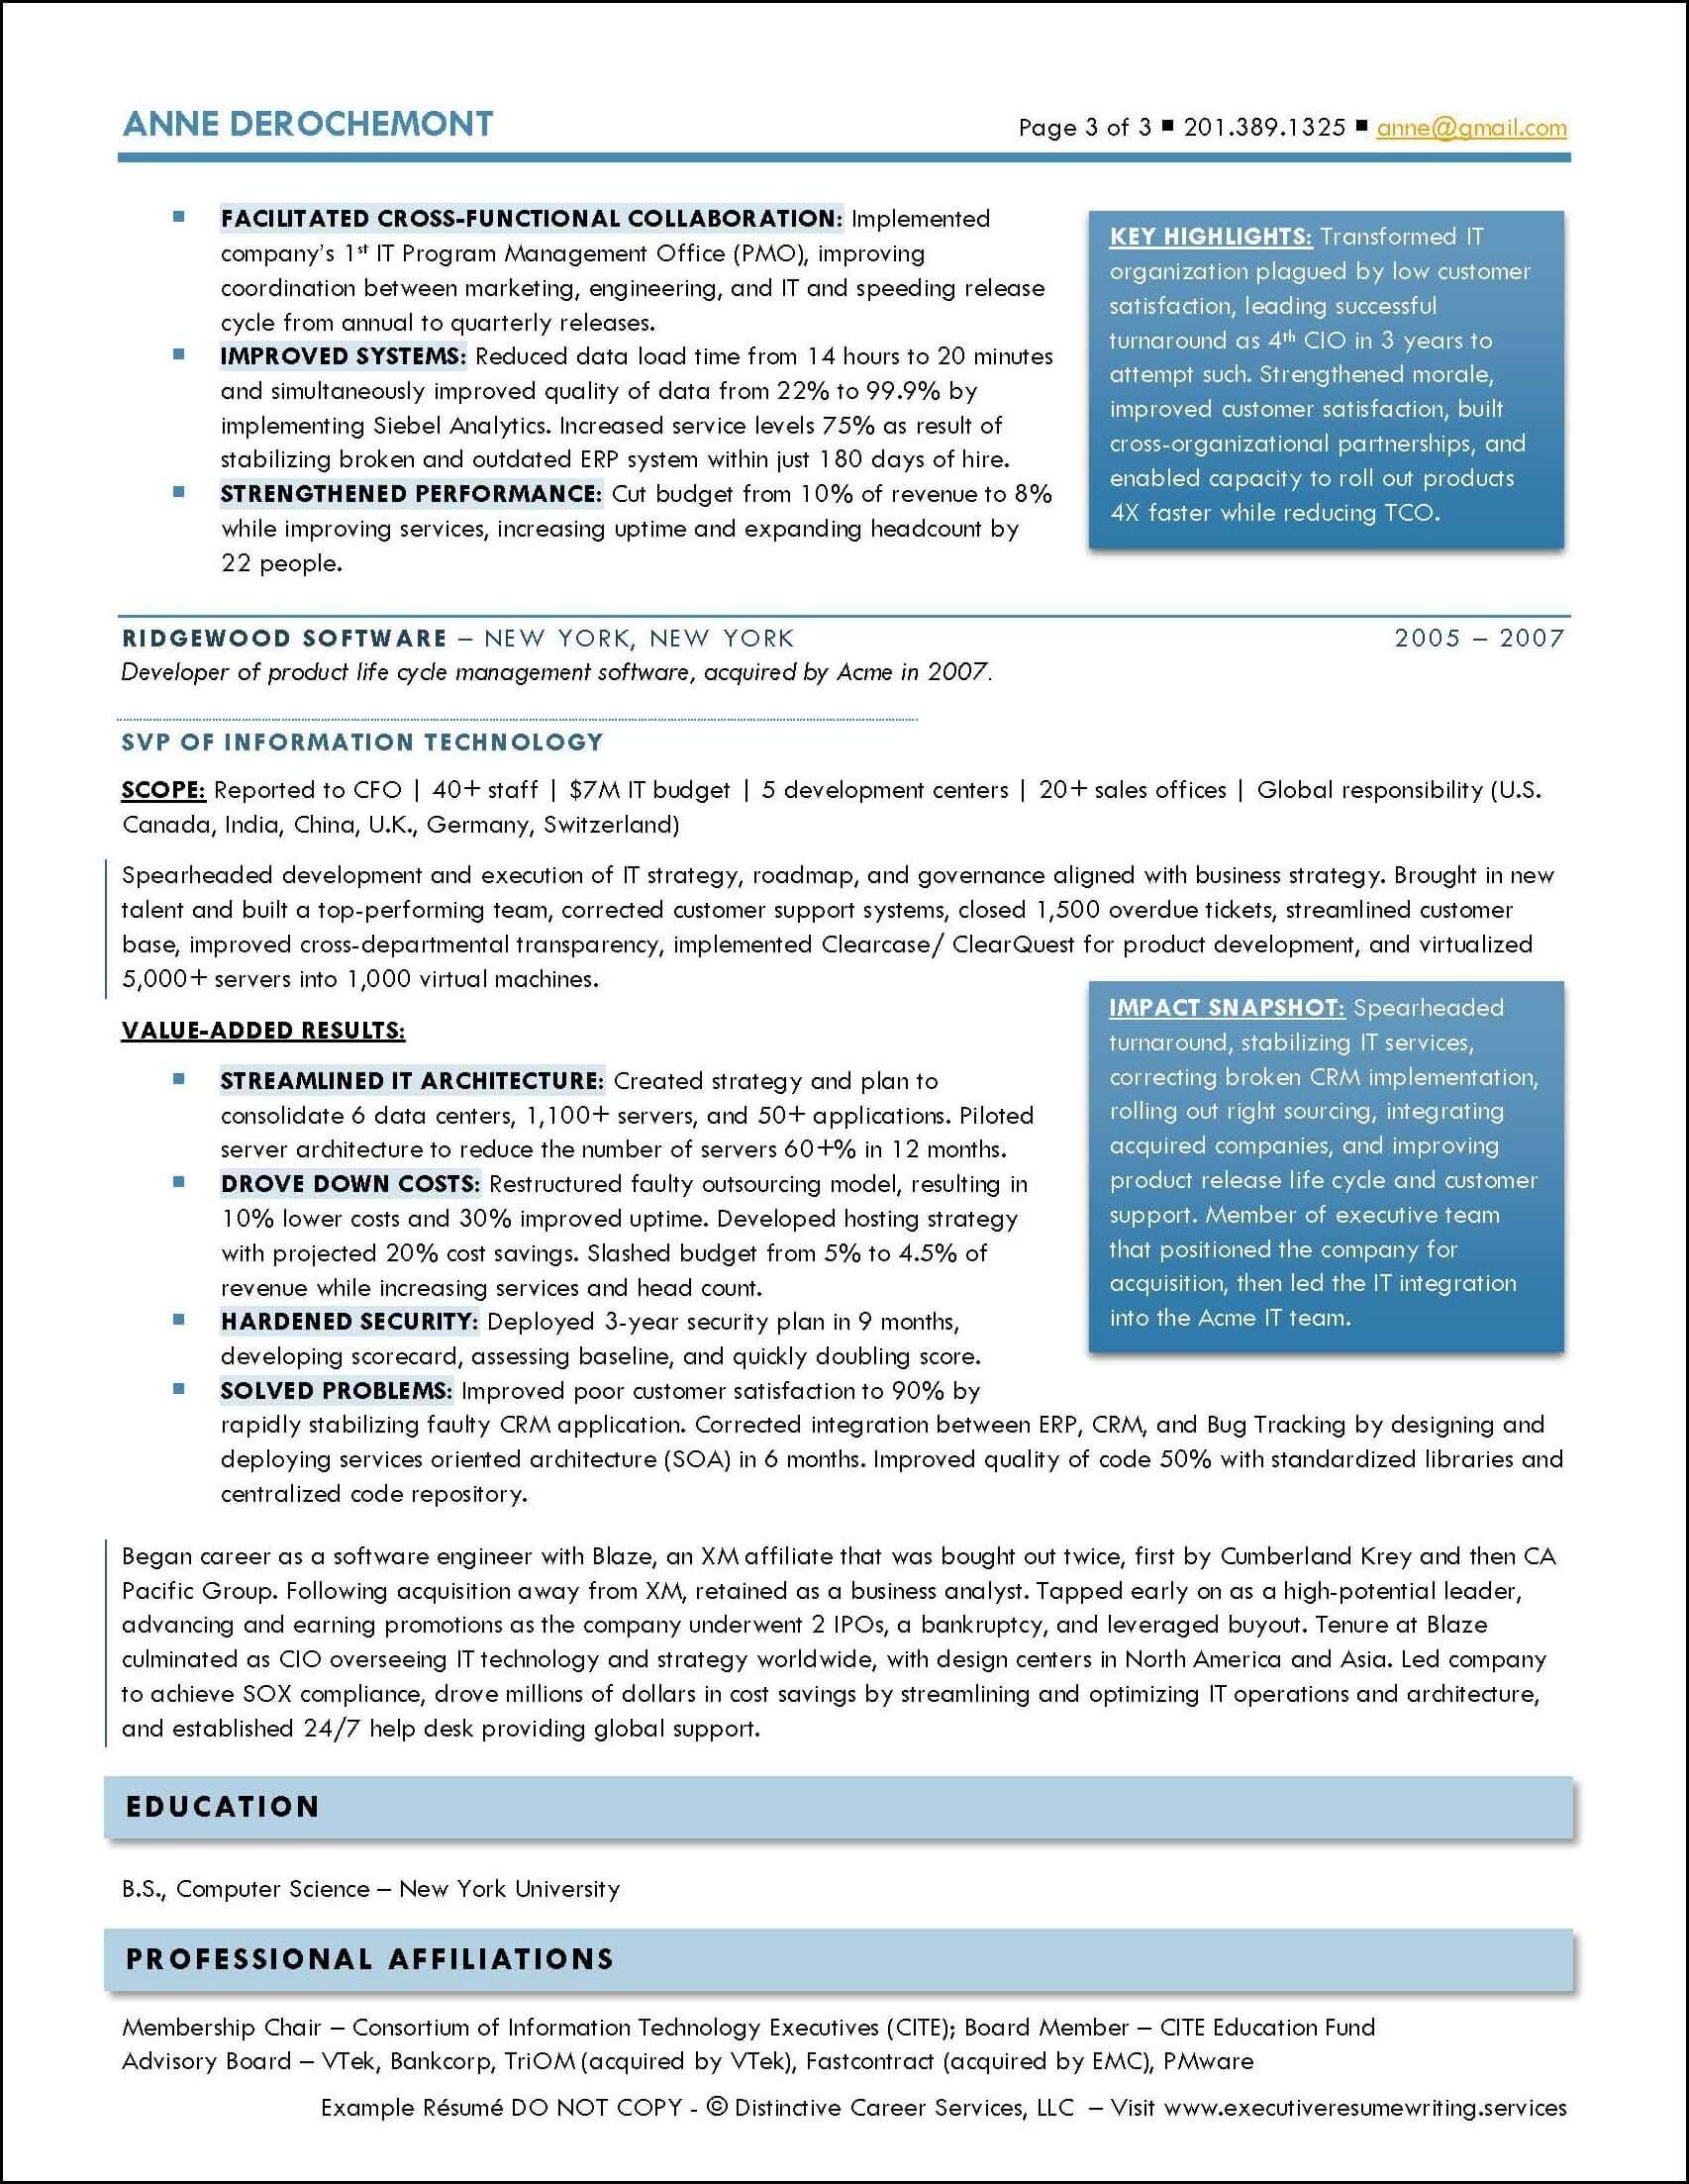 Example Executive Resume - CIO- pg3